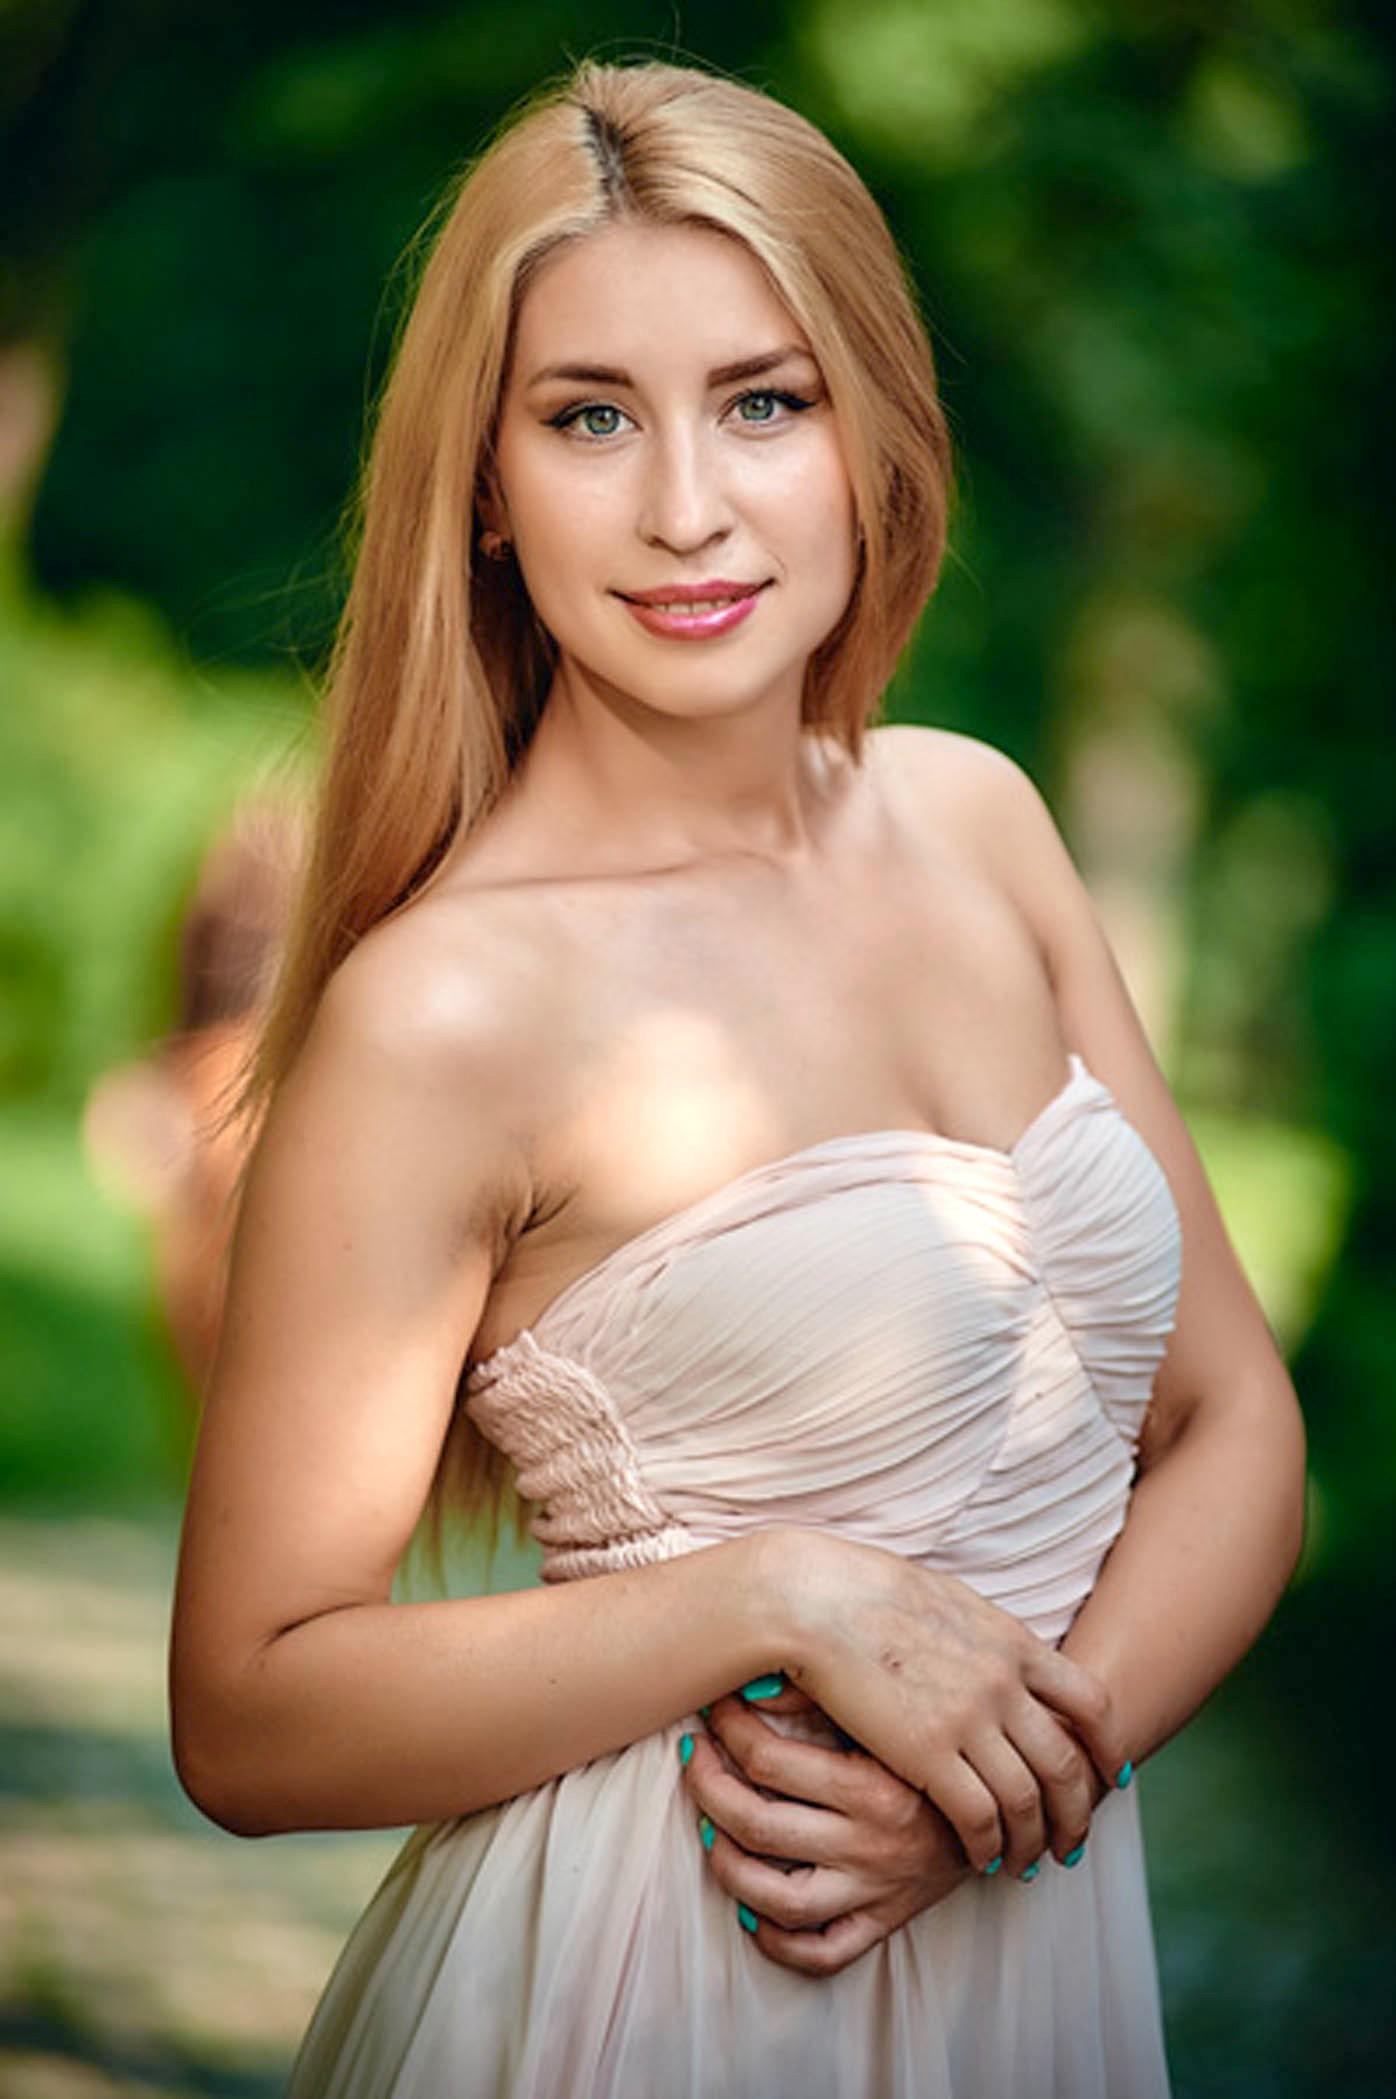 Ukrainian brides 331 views